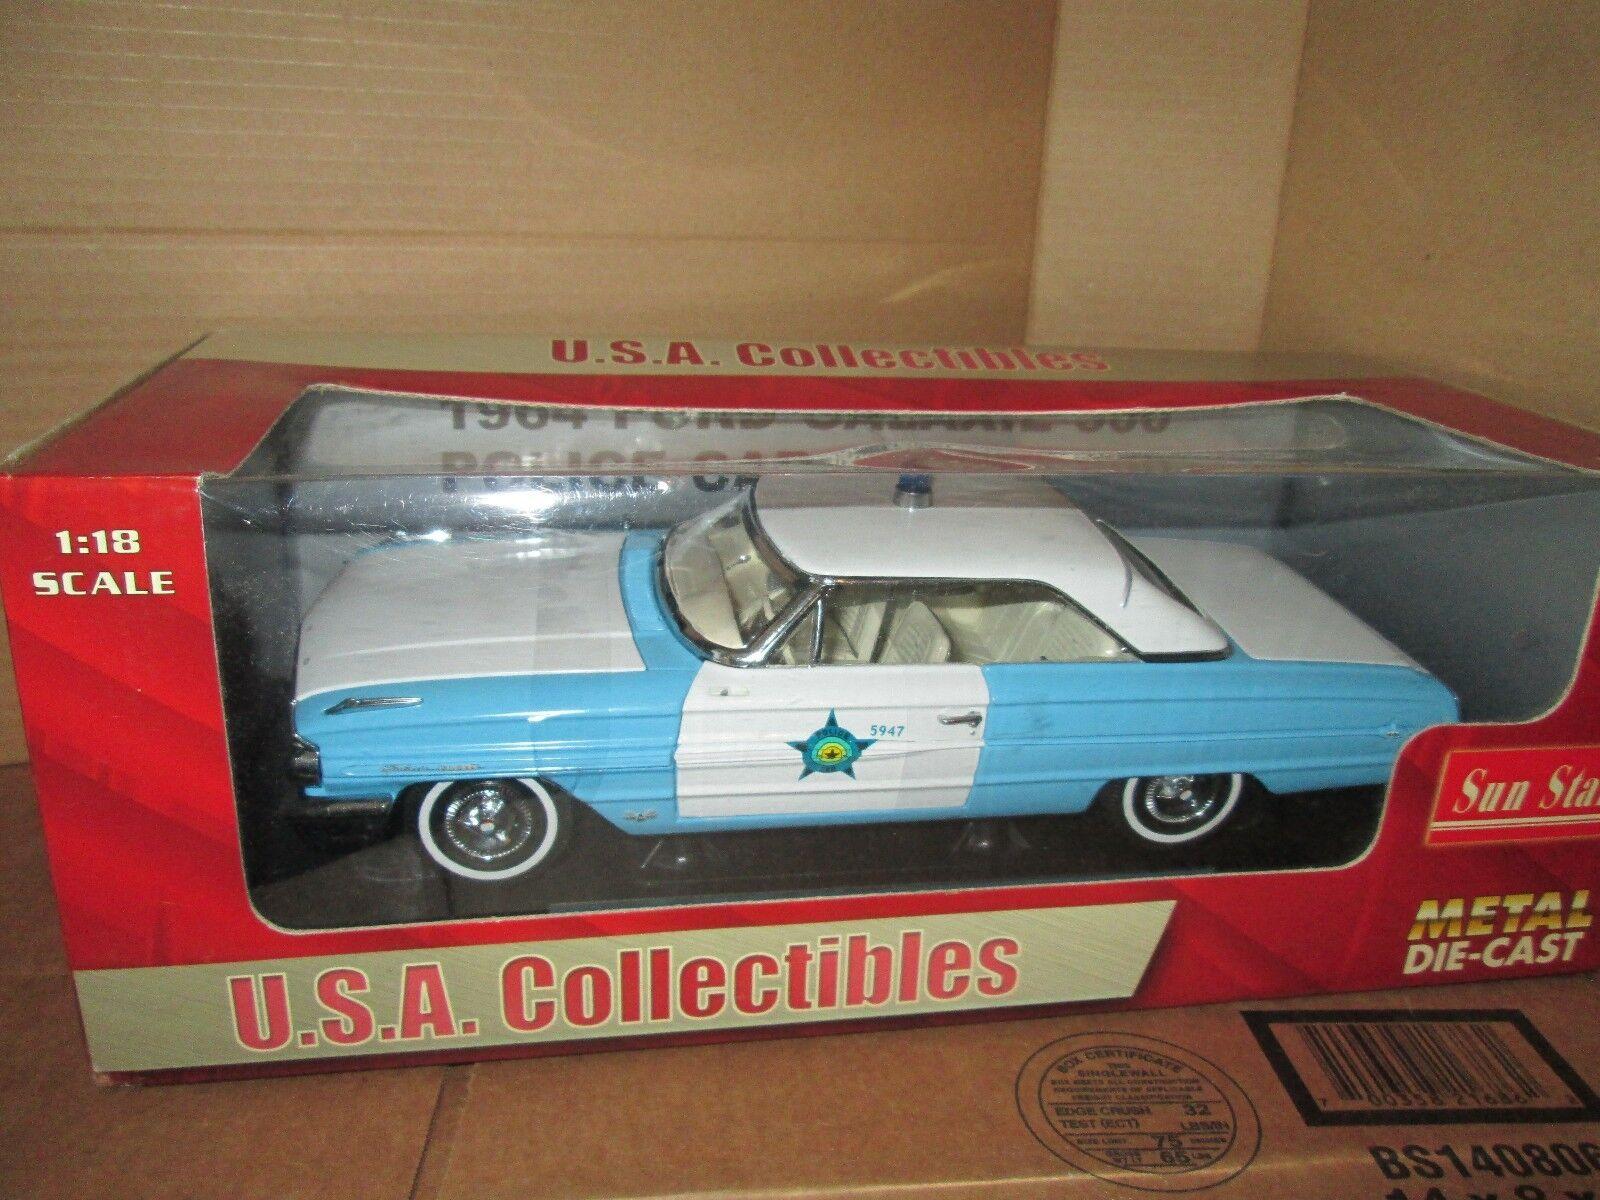 64 FORD GALAXIE 500 police car  1 18 1964 sunstar 1 18